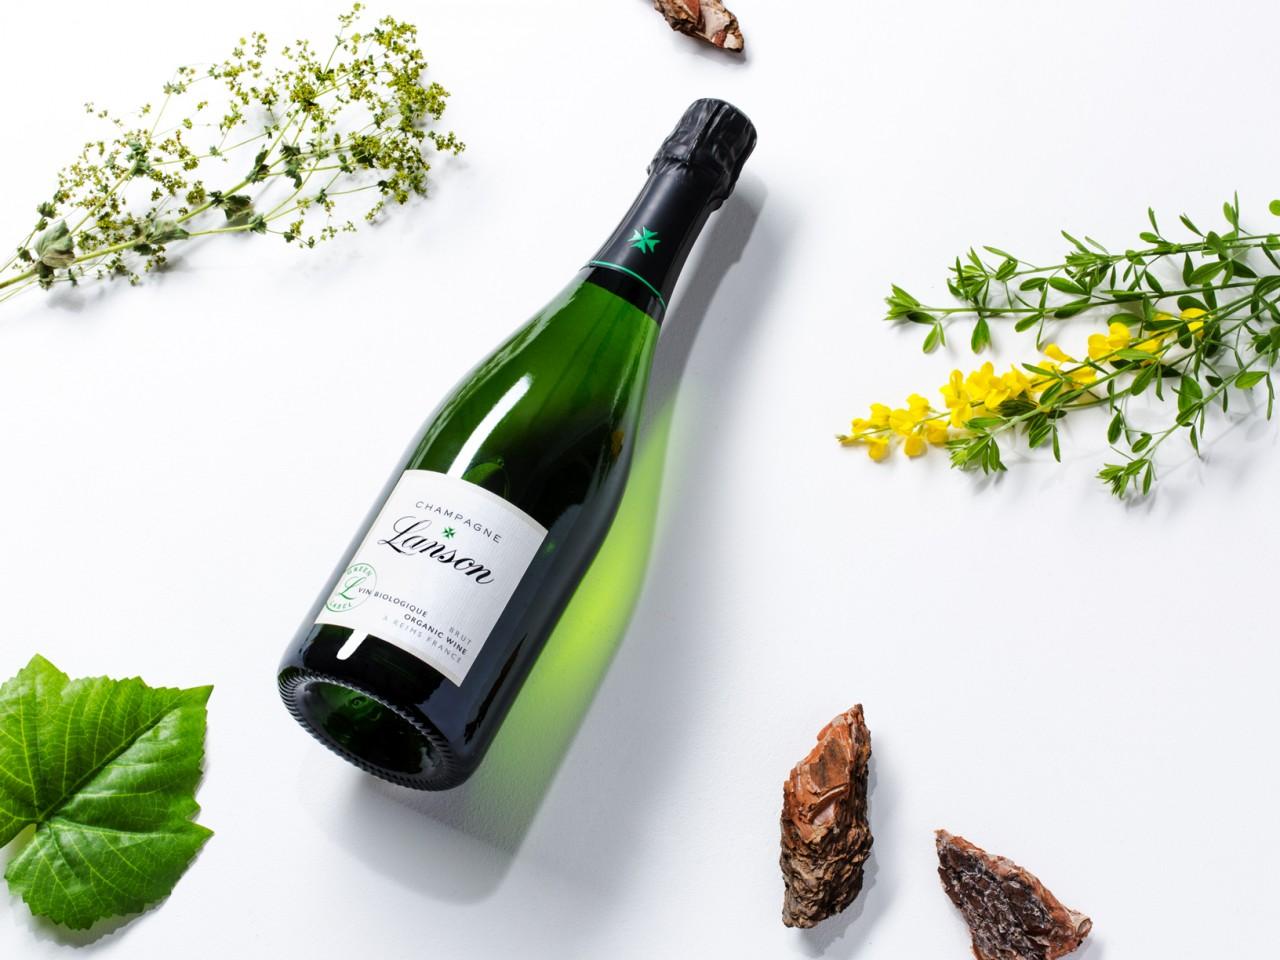 Vincent Chatelet Lanson Green Label